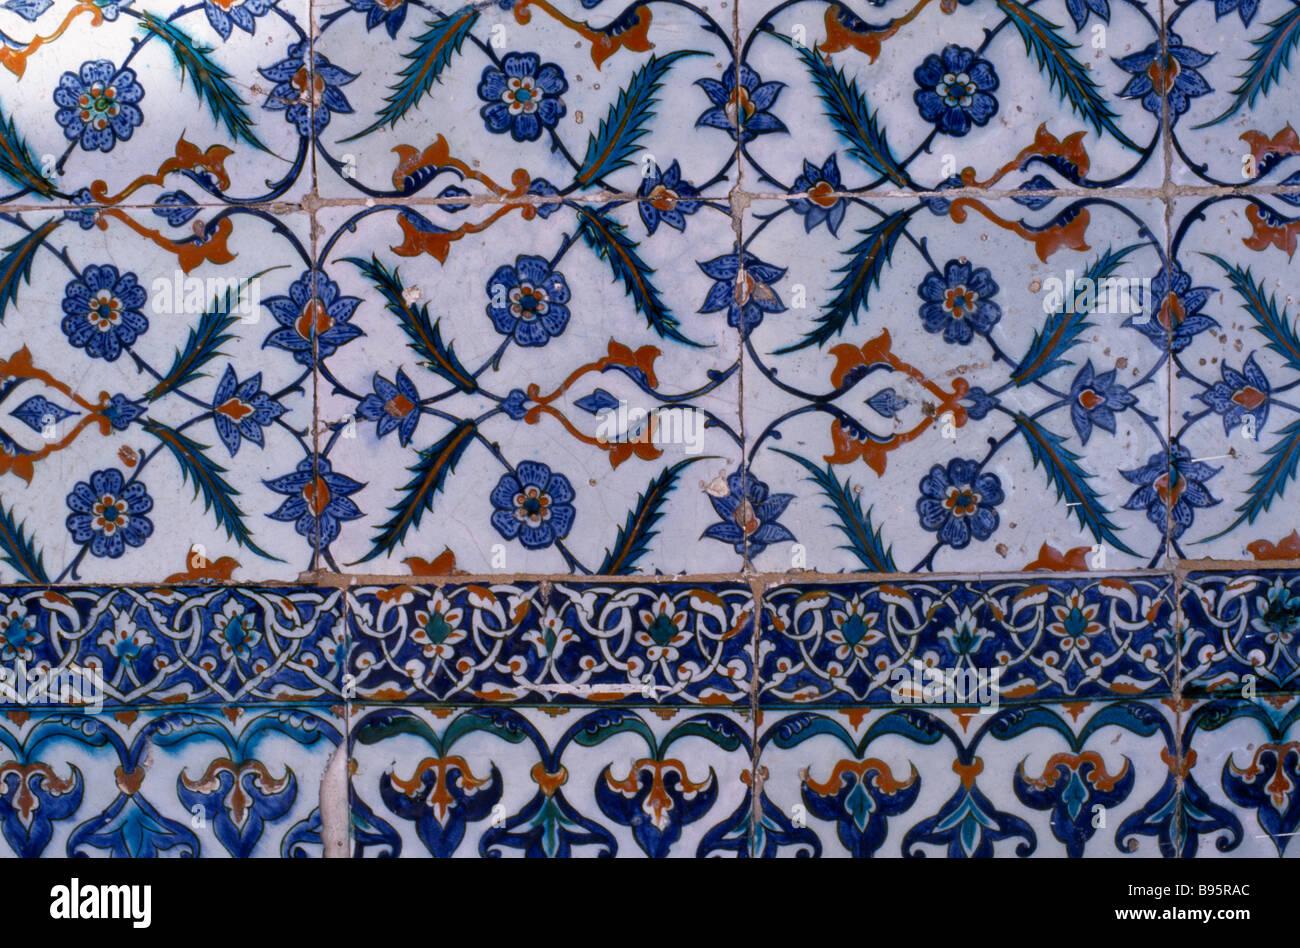 TURKEY Istanbul Seragkio Point. Topkapi Palace detail of Iznik tiles with blue stylised floral motif. - Stock Image